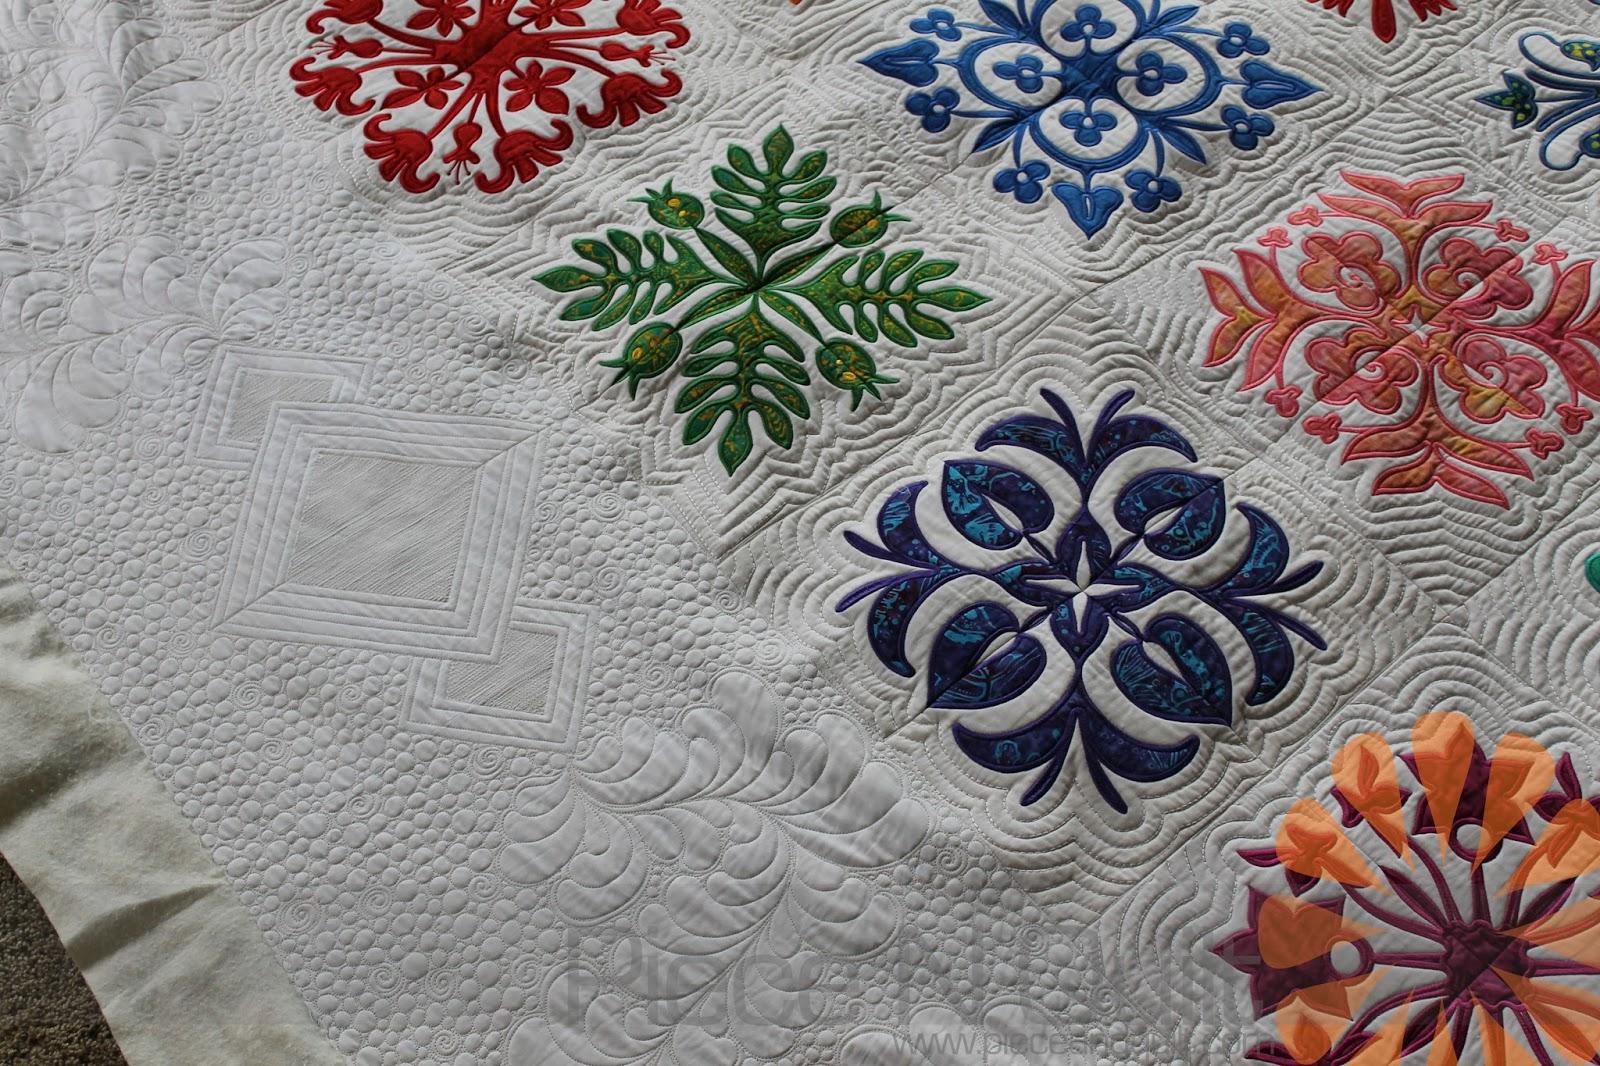 the appliqu getz hawaii by quilt quiltinspire quilts kapa on pinterest toni works best sampler images hawaiian